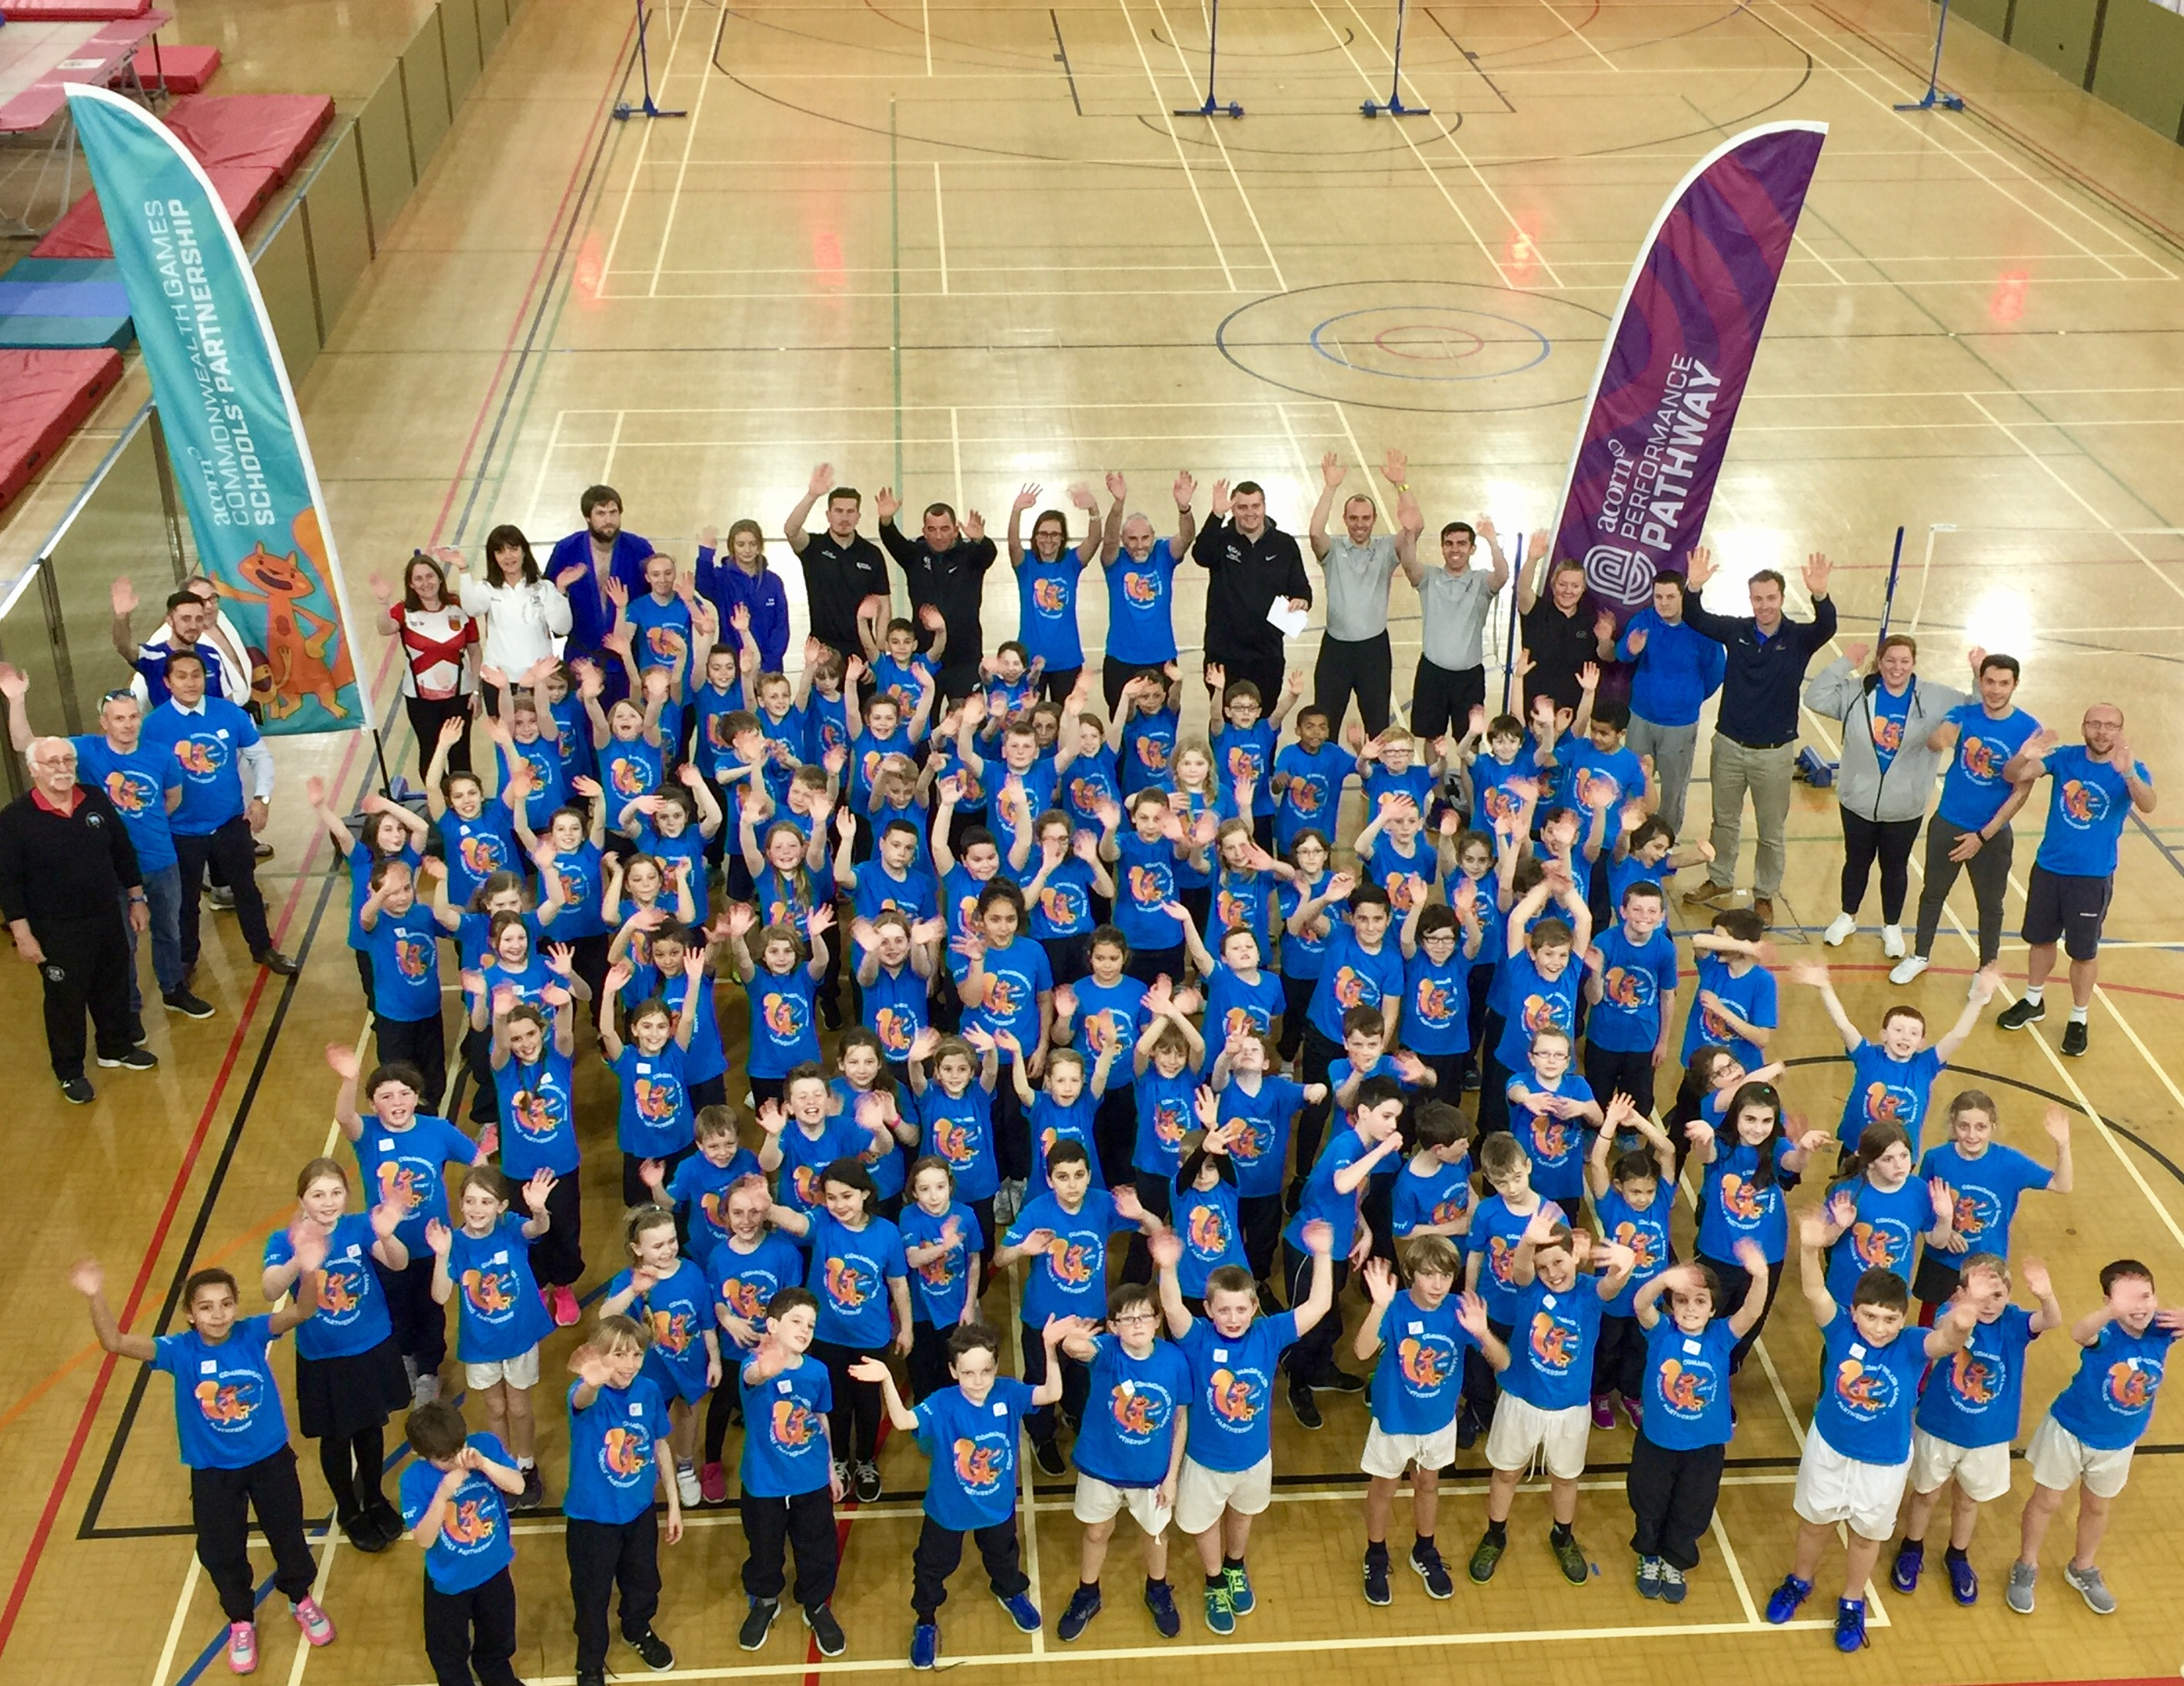 Acorn Commonwealth Games Schools' Partnership pupils picture